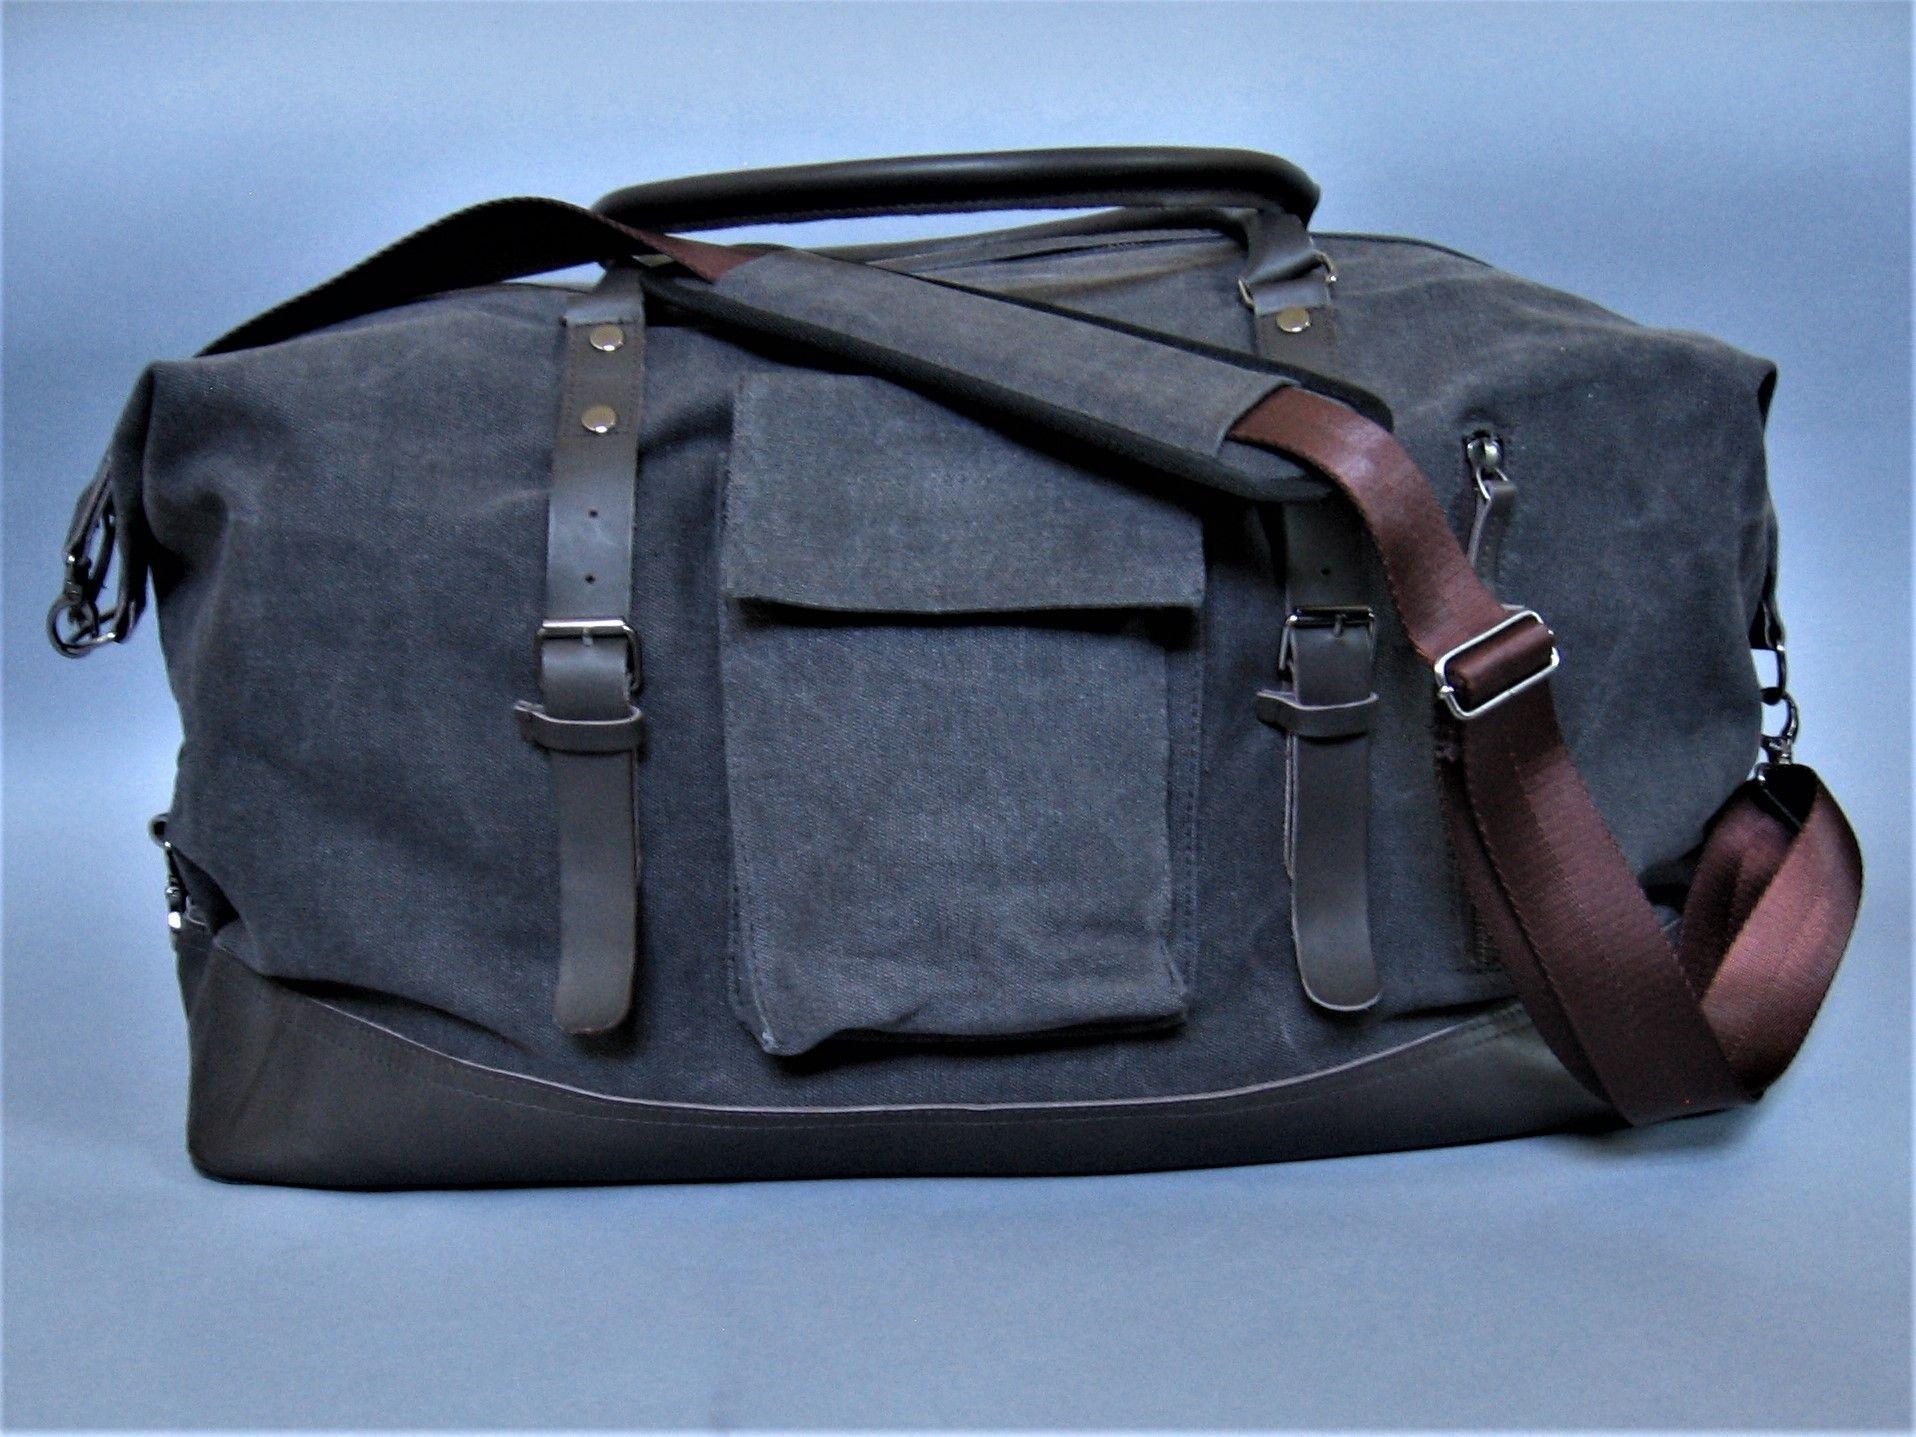 9e770c89ab  84.95 Duffle bag extra large perfect travel bag for men or women. Nylon  lining YKK